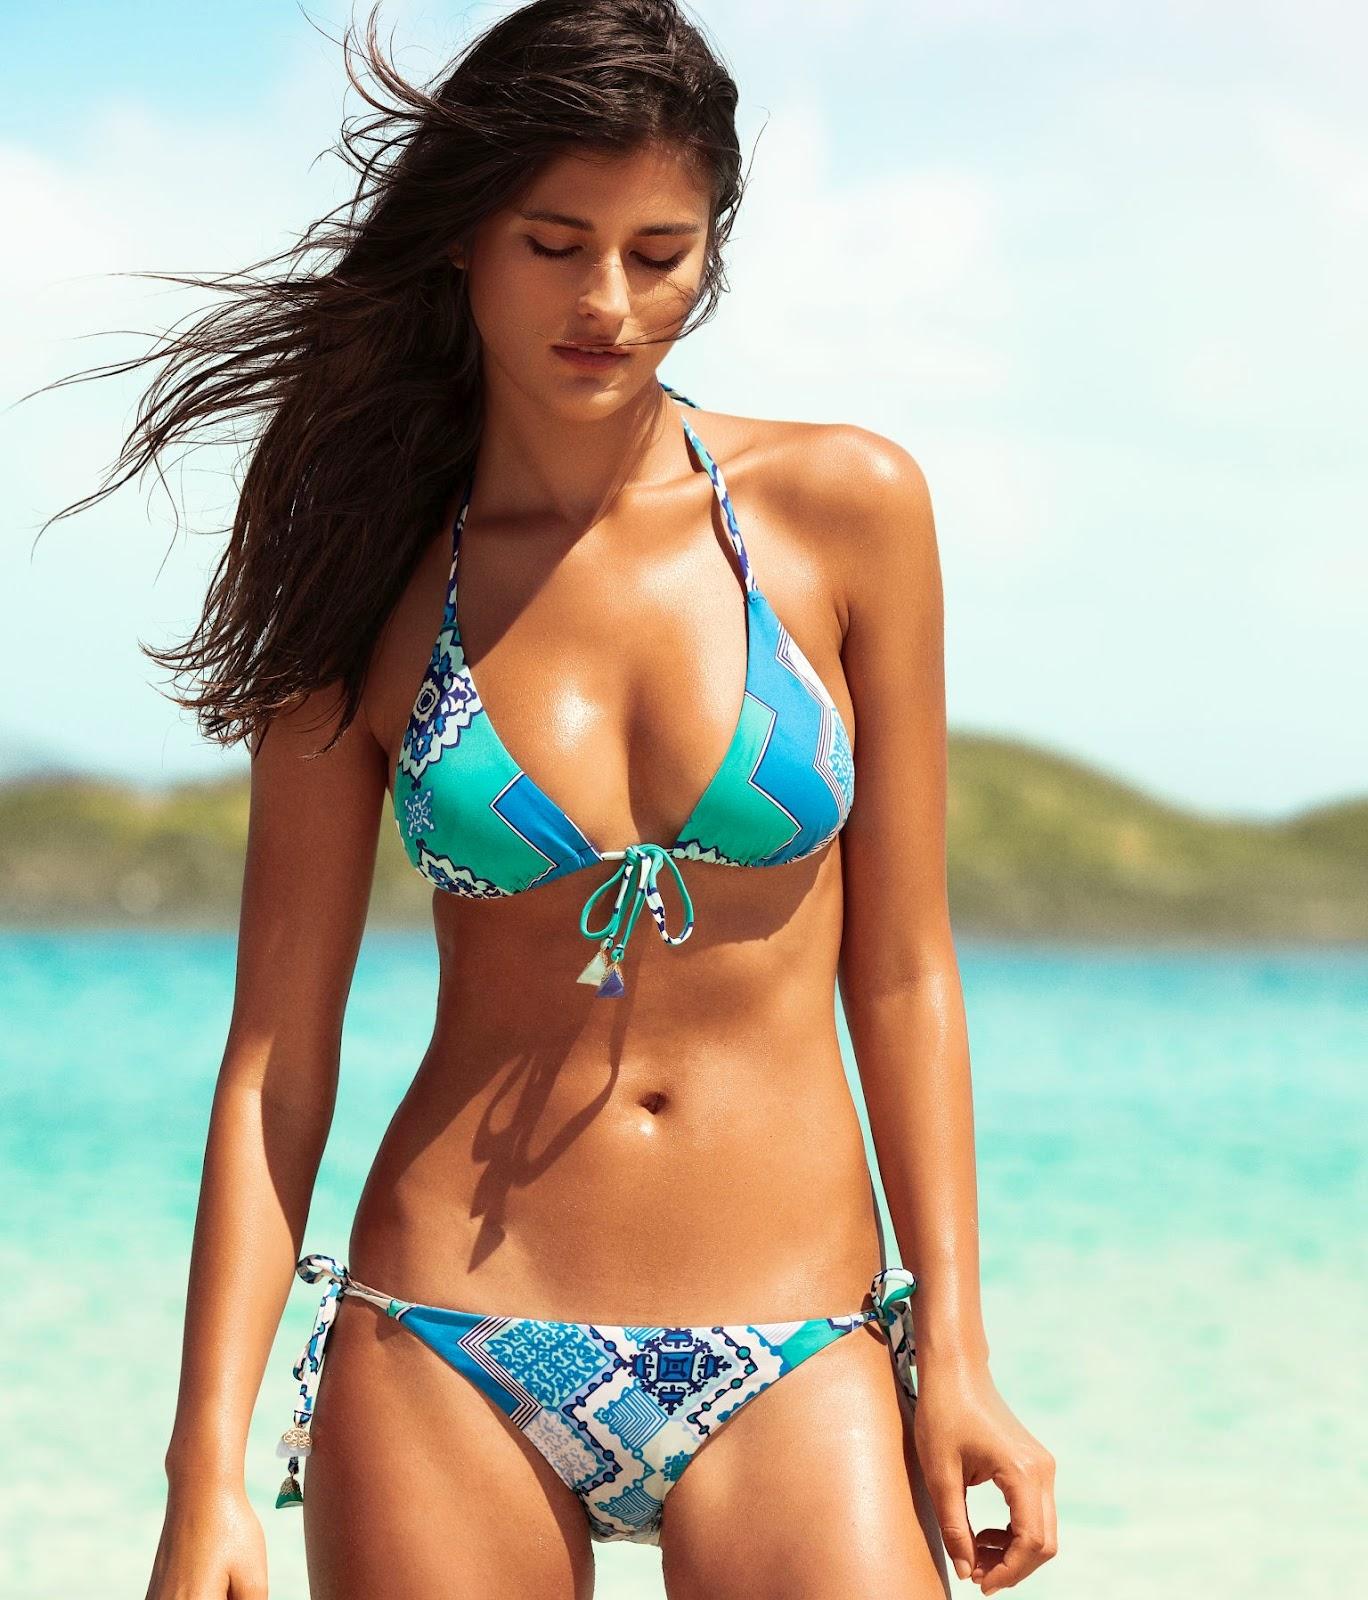 Bikini malfunction powered by phpbb